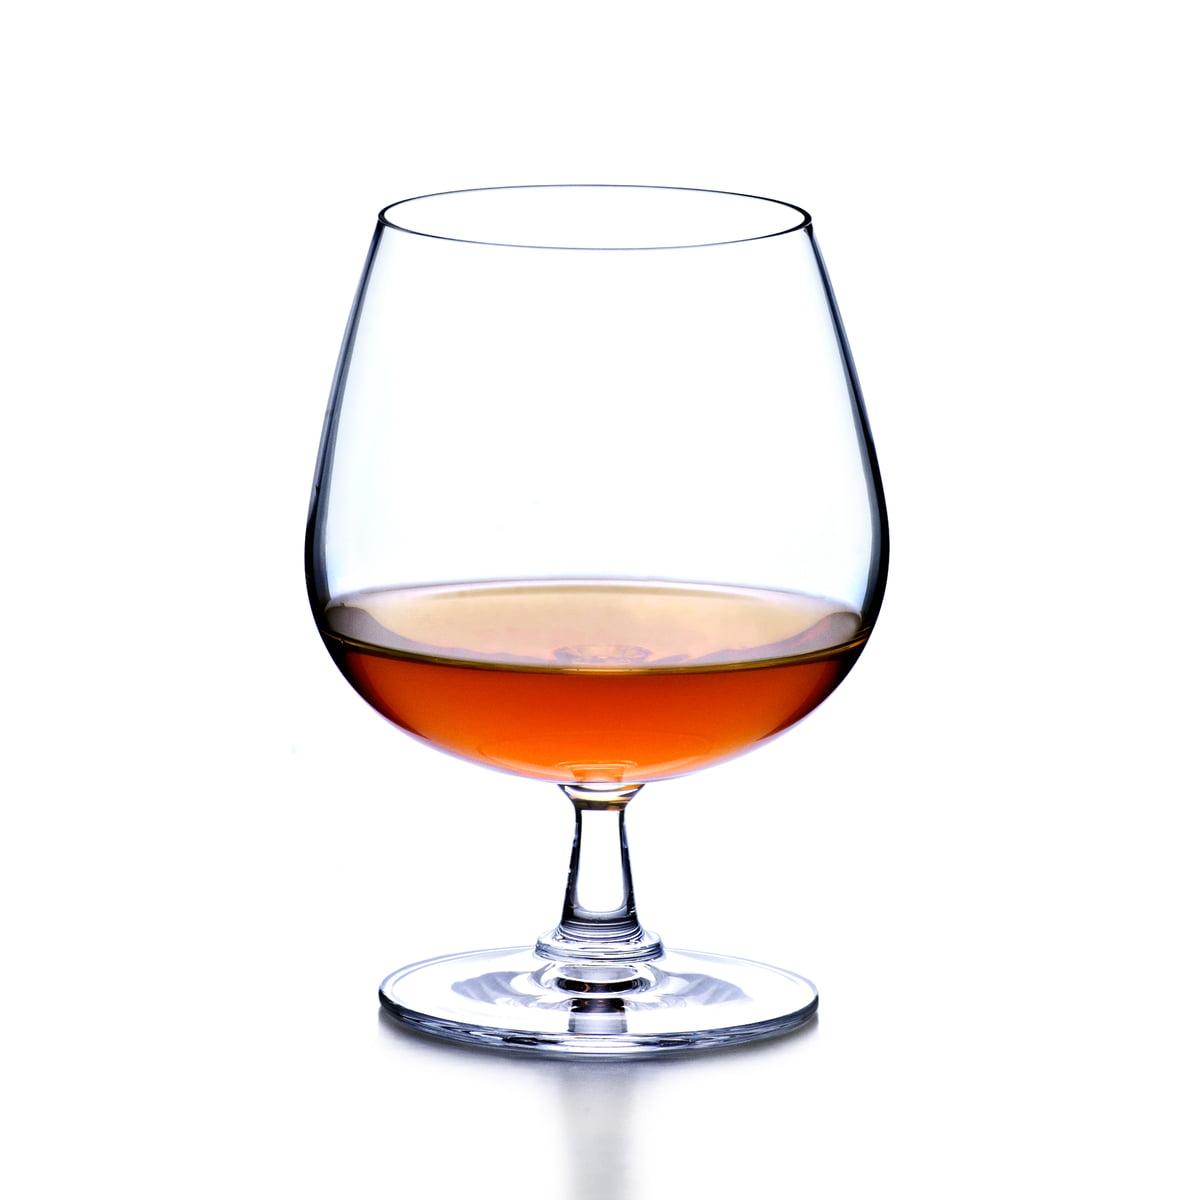 rosendahl grand cru cognac glass. Black Bedroom Furniture Sets. Home Design Ideas